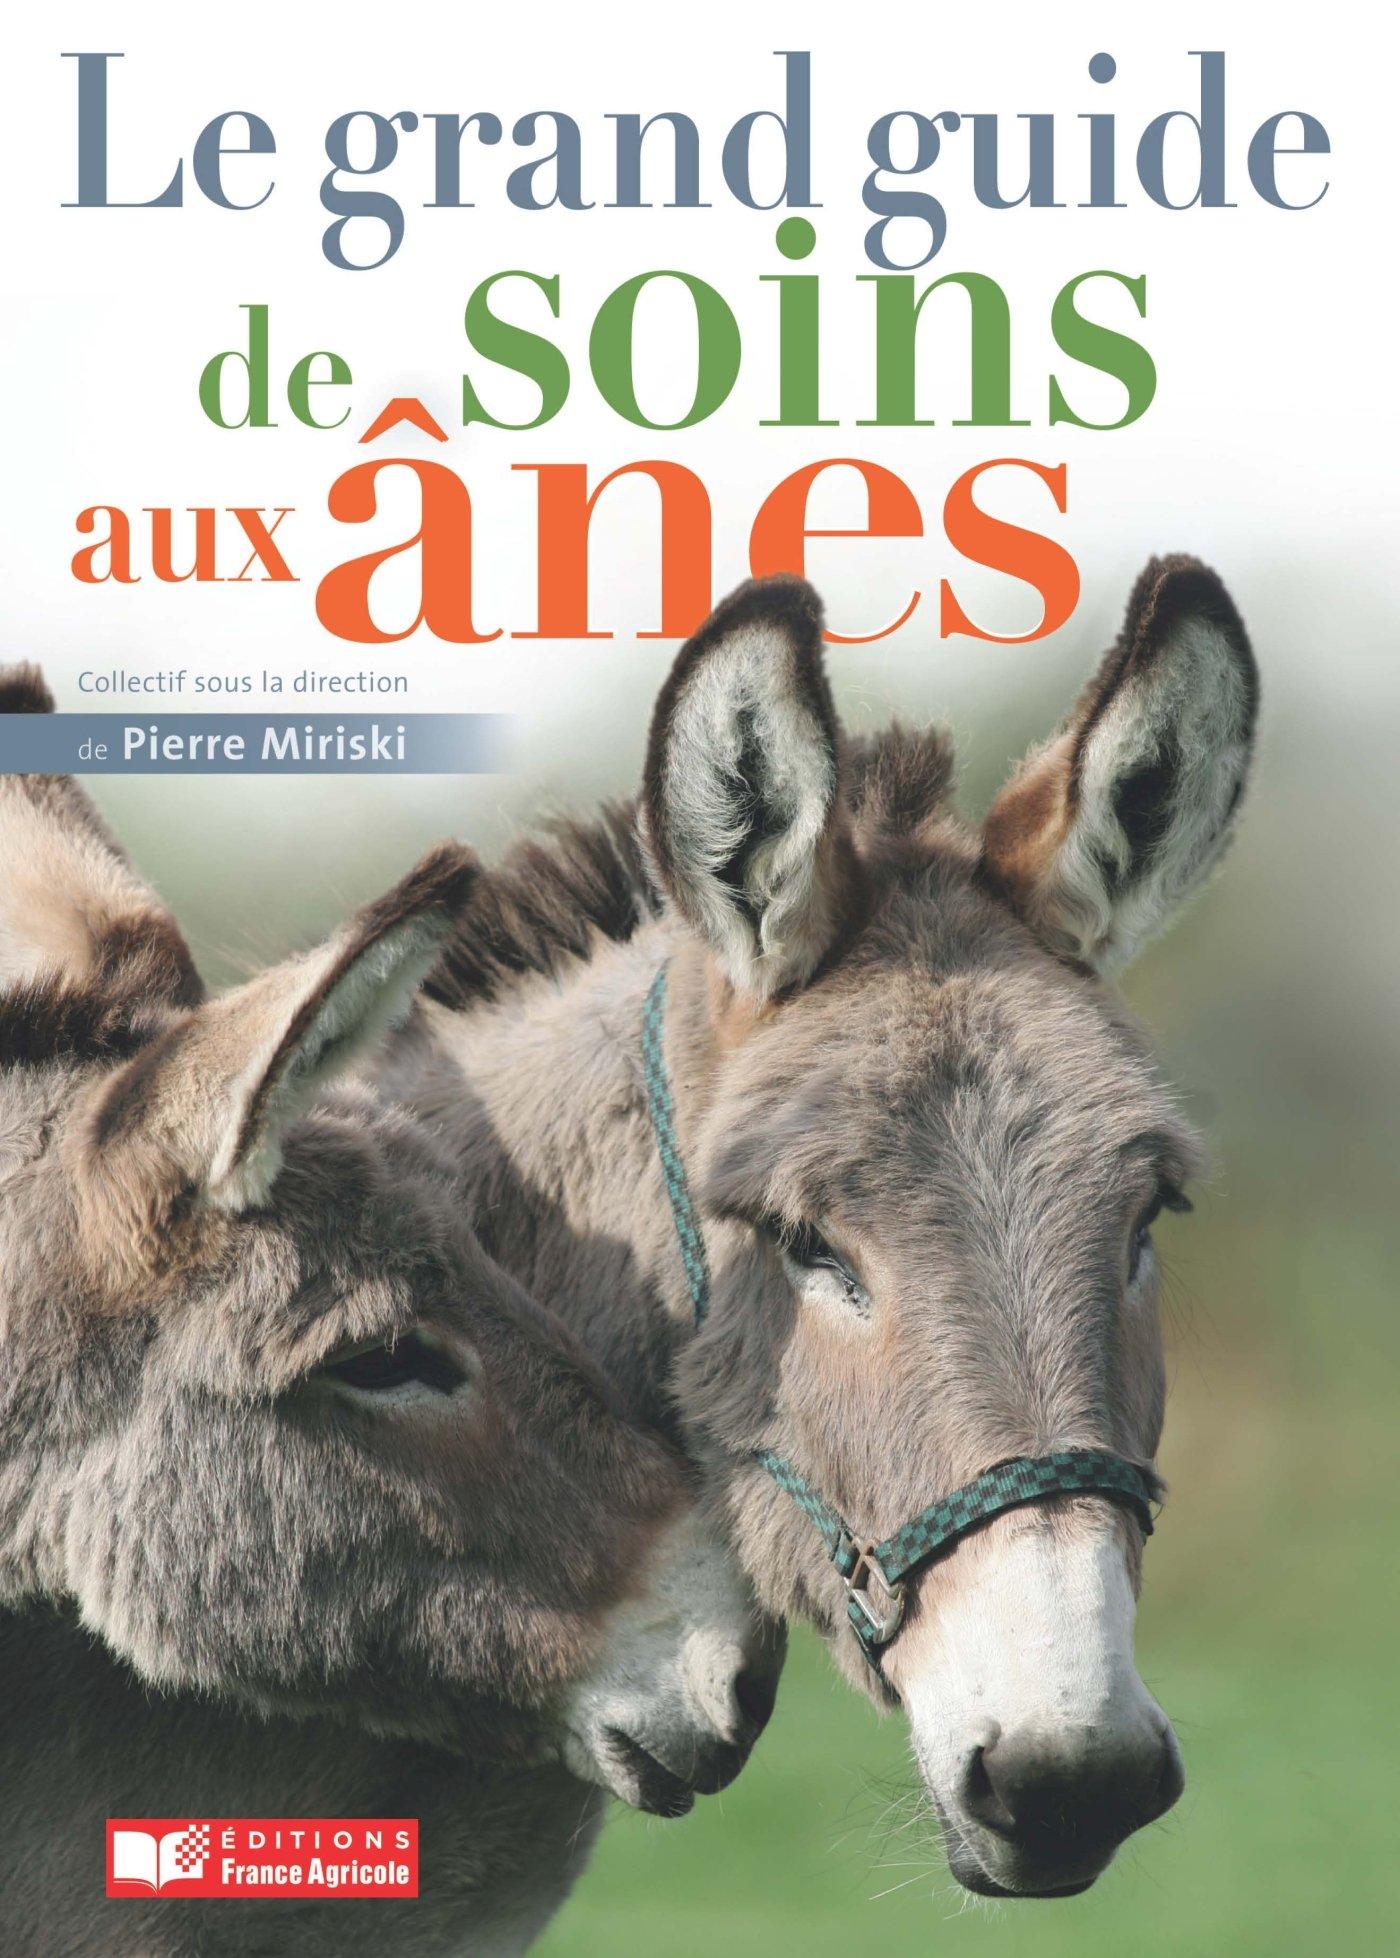 Le Grand Guide Des Soins Pour Les Anes Fa Sante Animal Amazon Co Uk Miriski Pierre 9782855574172 Books